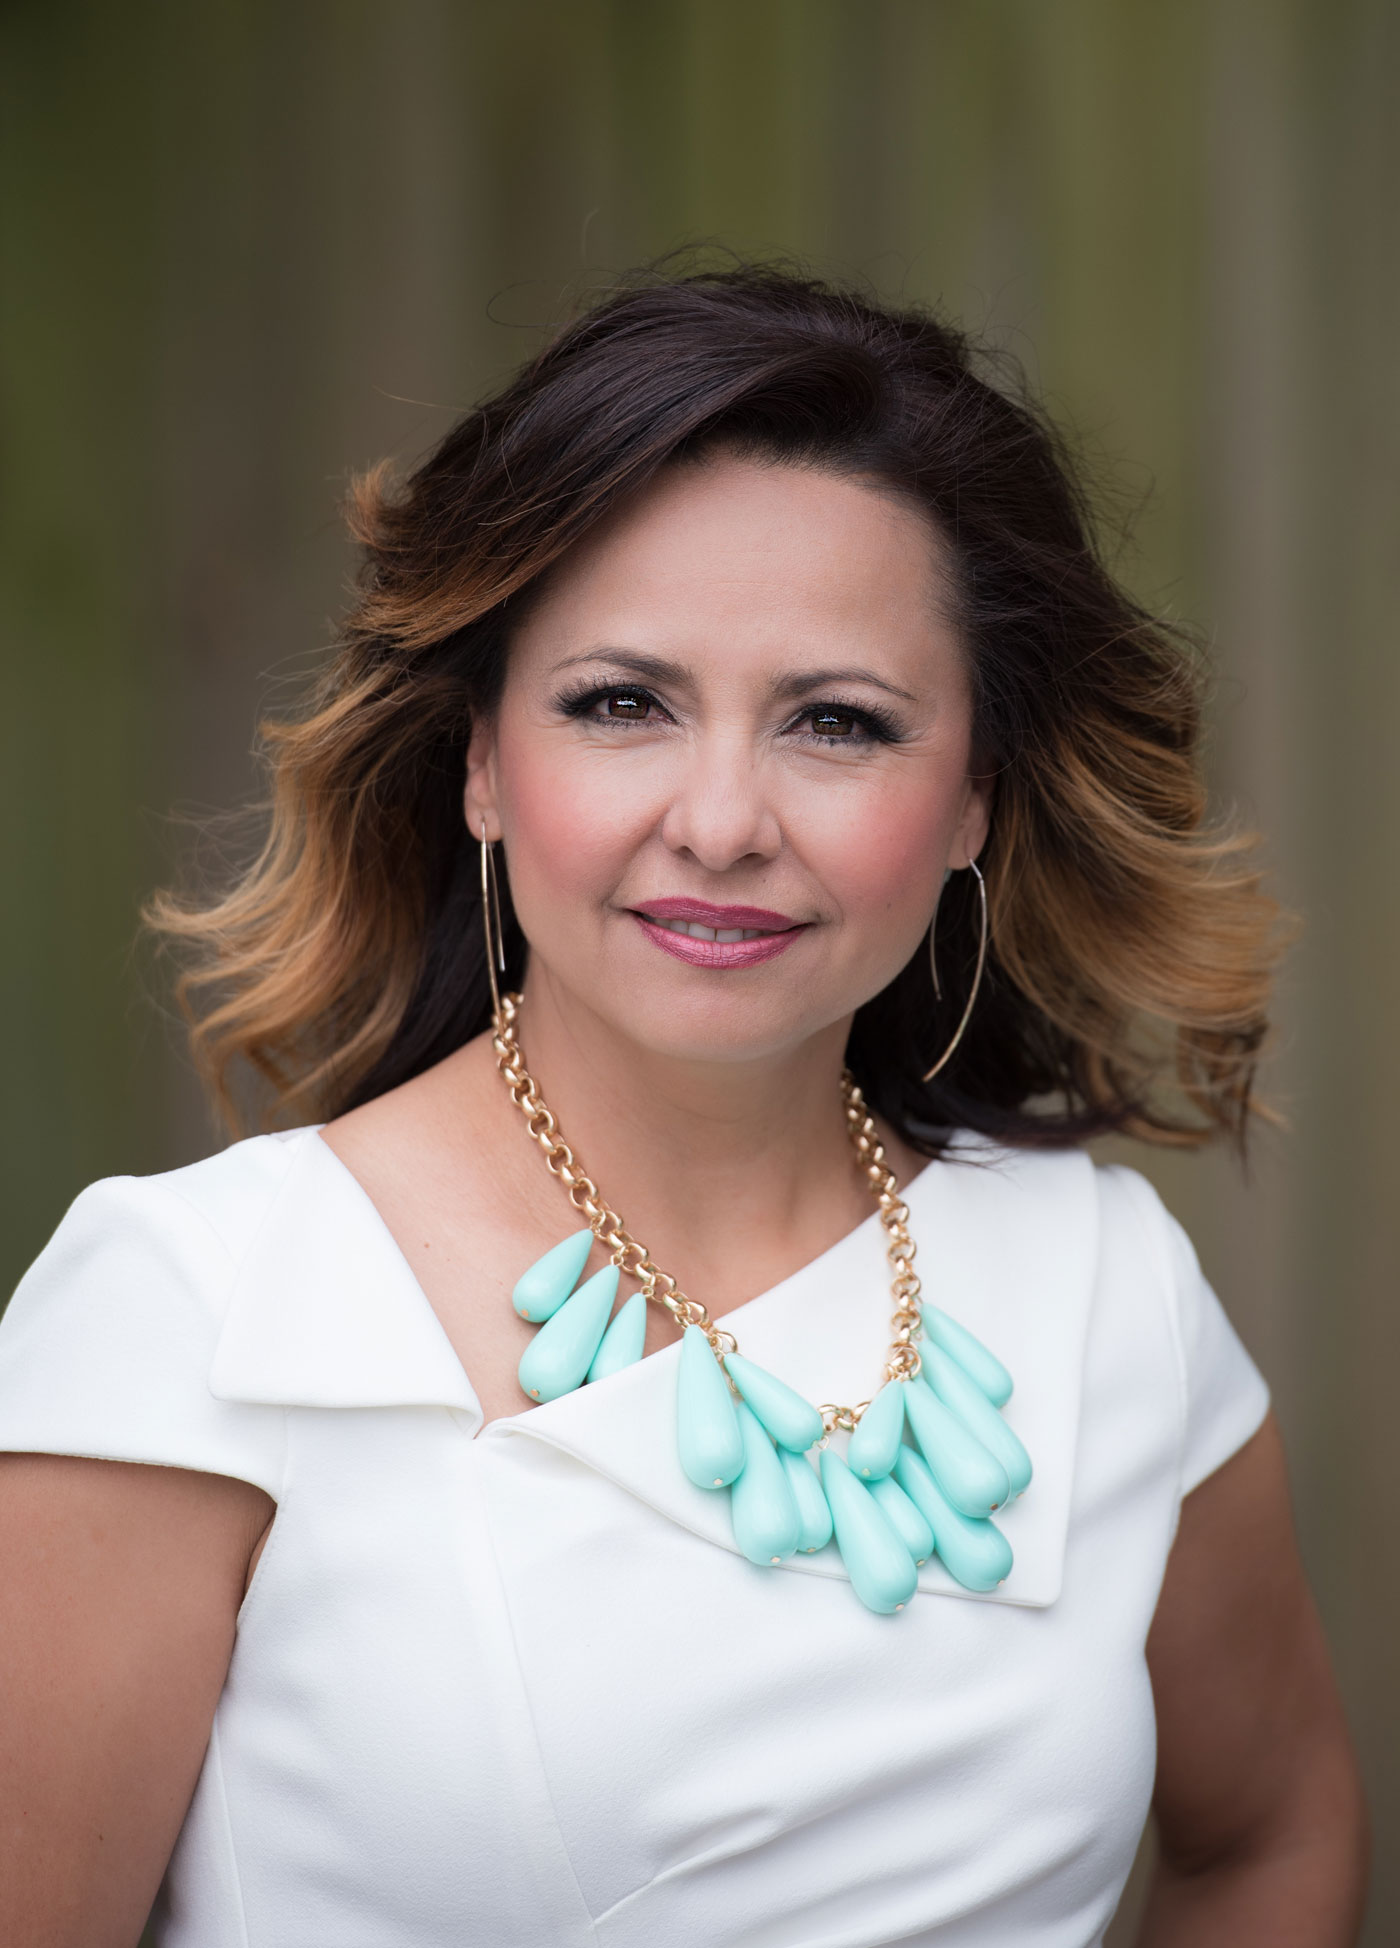 Thelma Sifuentez, Owner